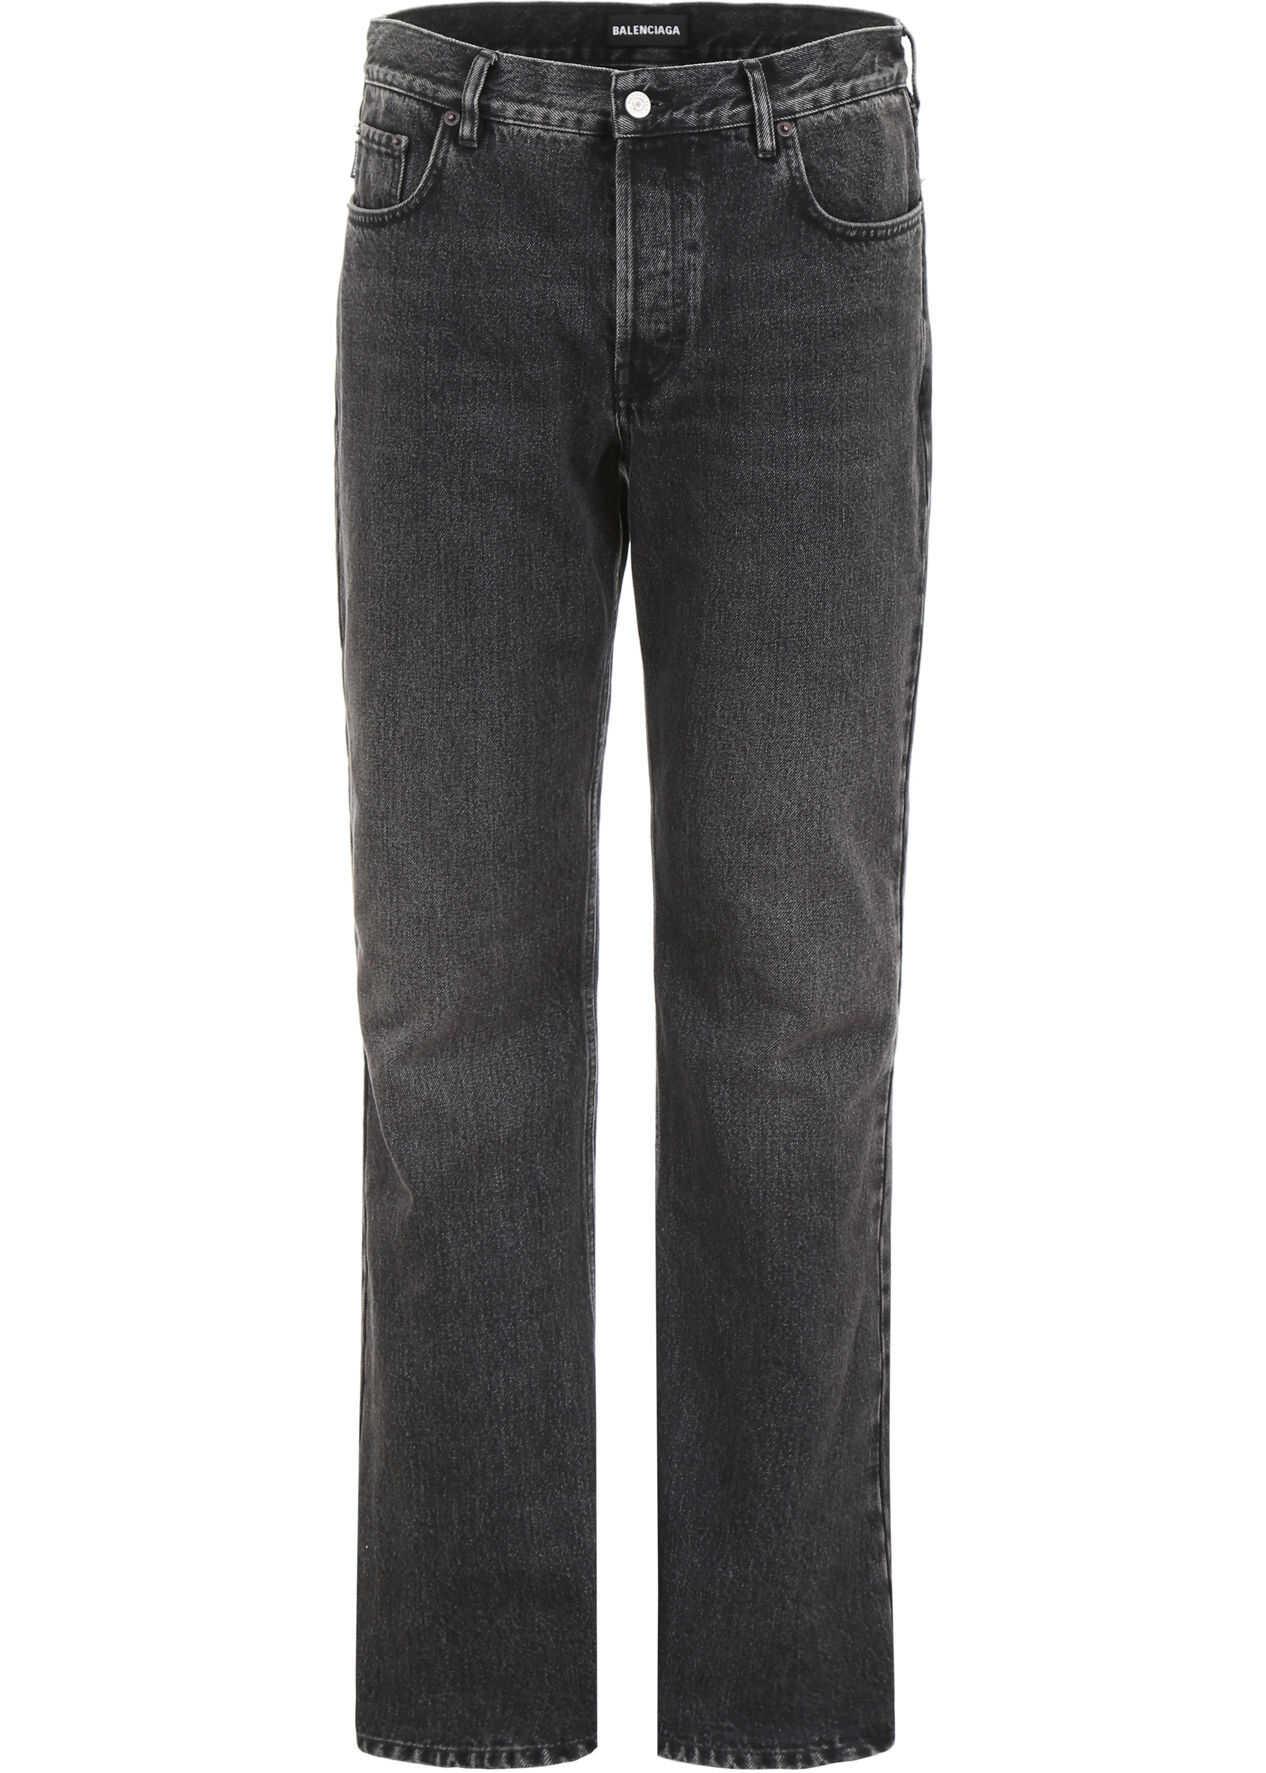 Balenciaga Boot Cut Jeans VINTAGE BLACK